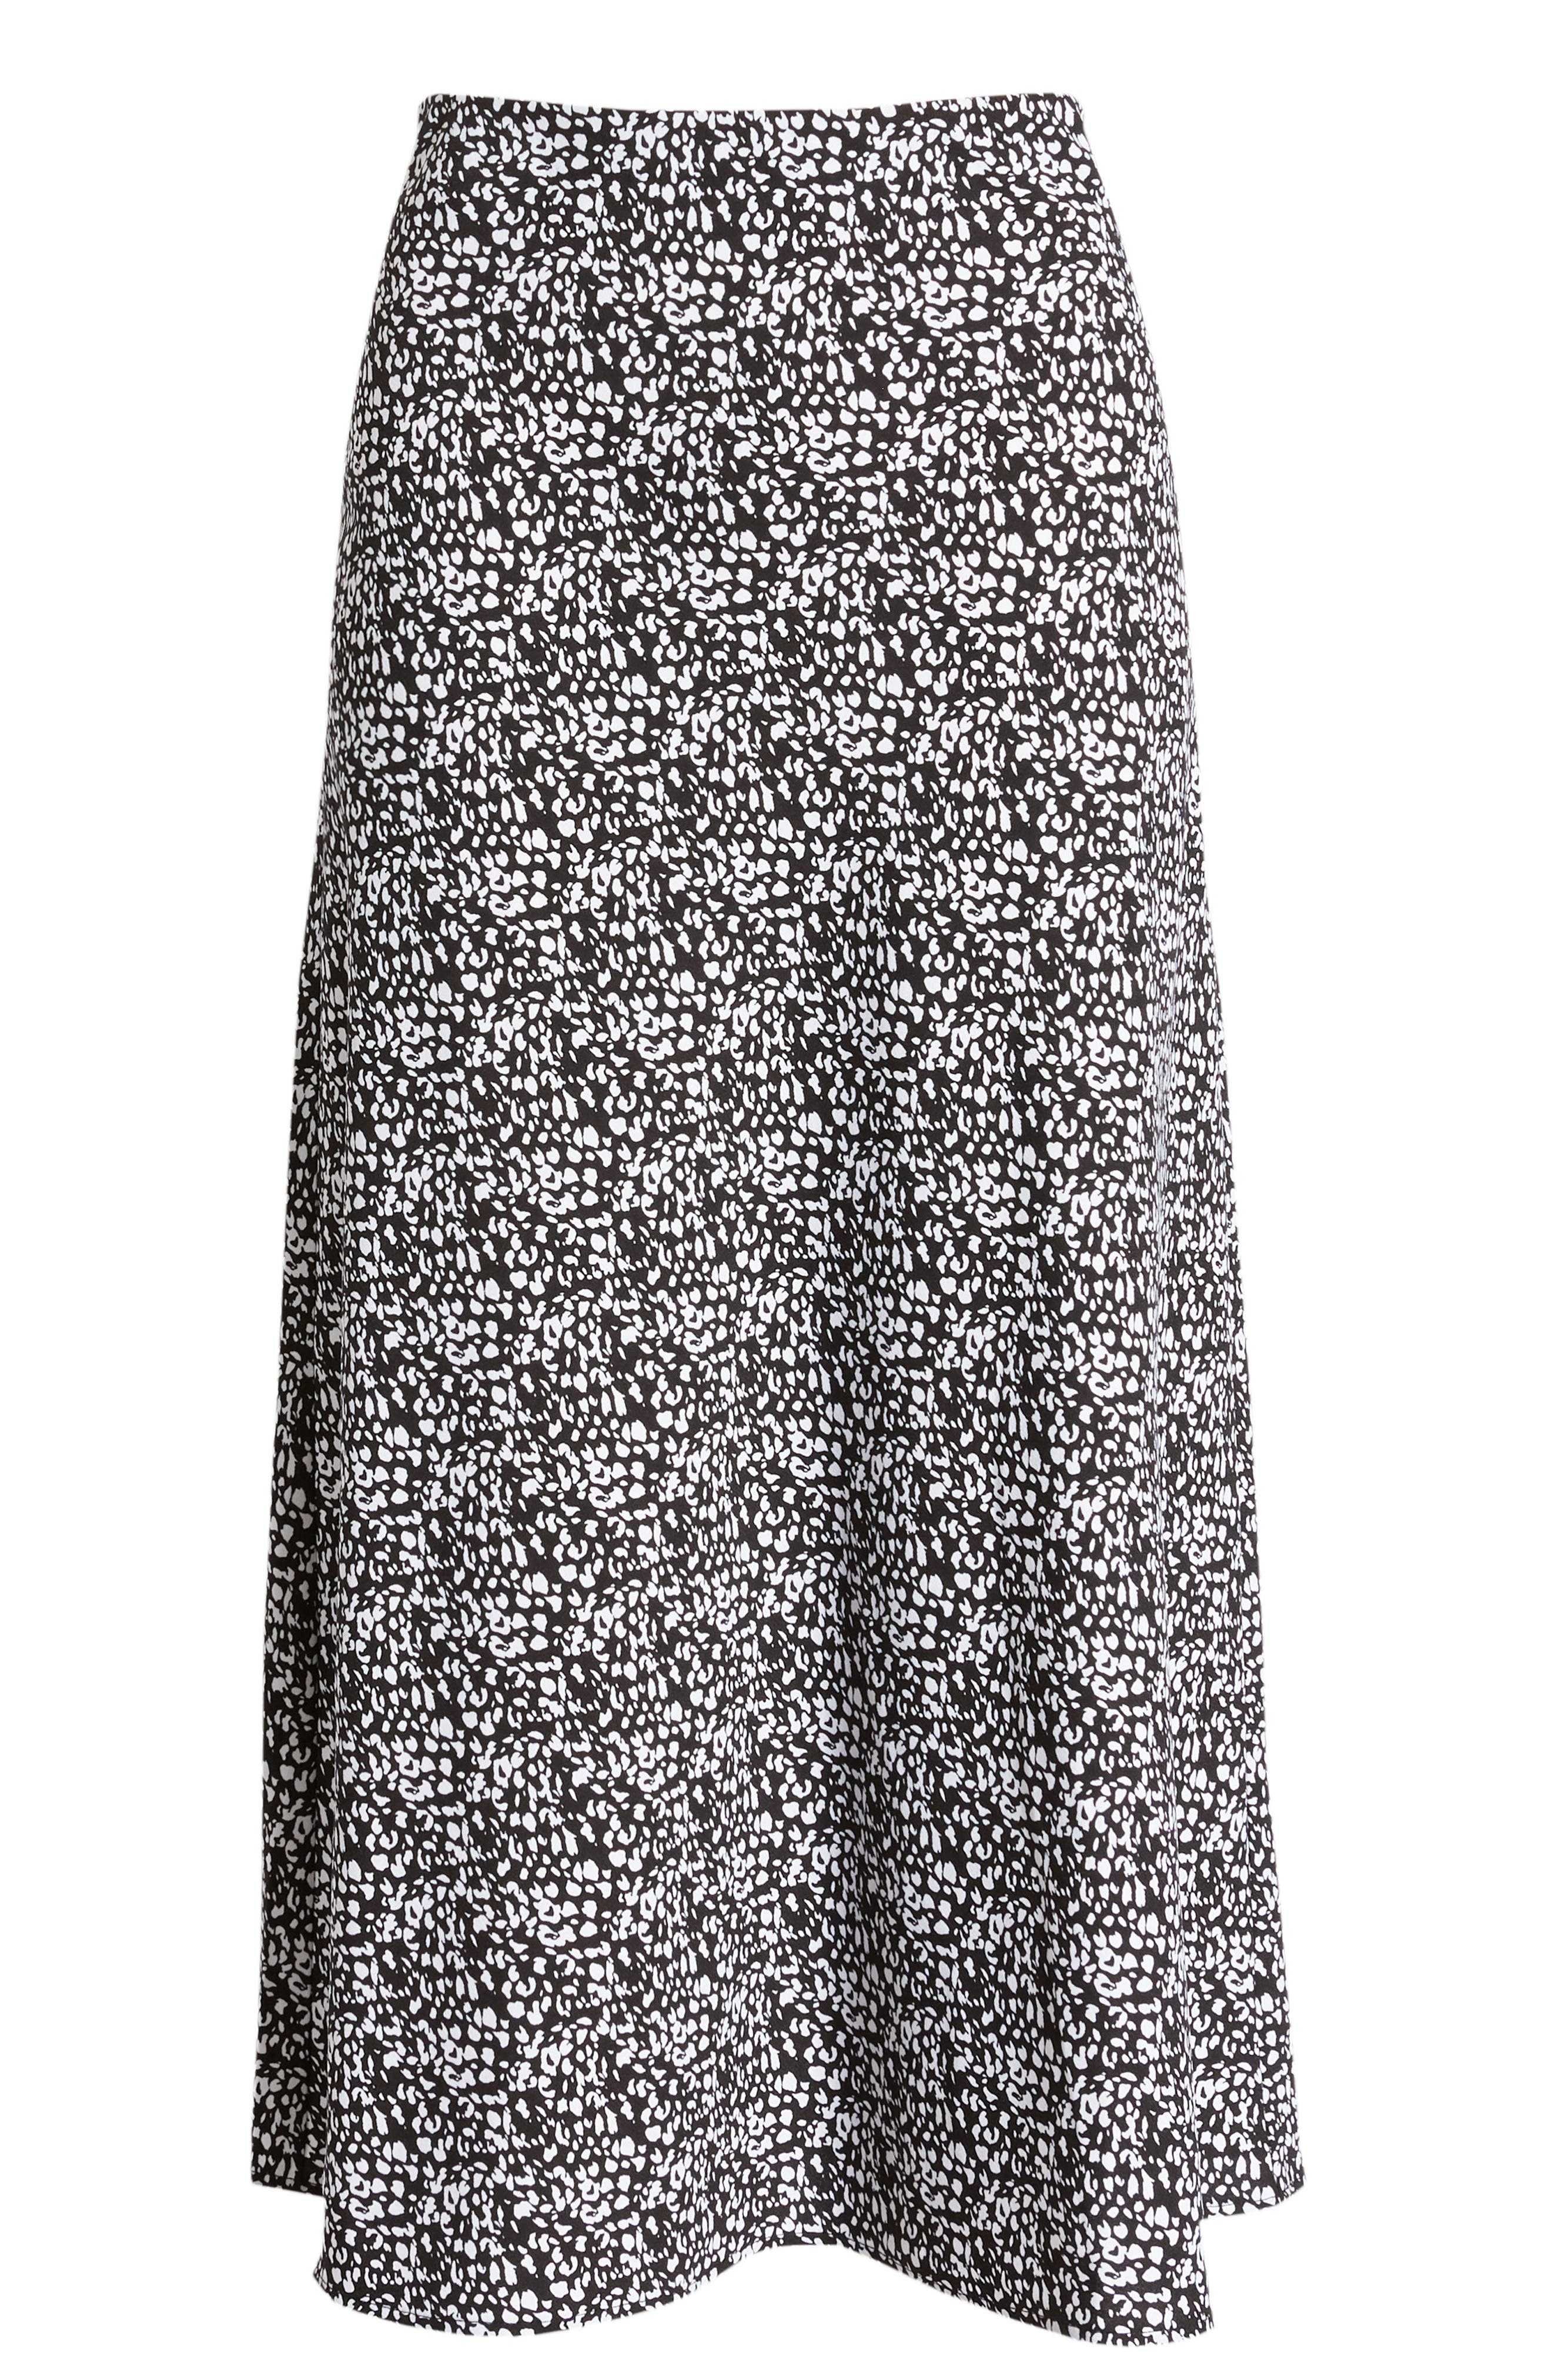 Roxy Juniors Flip It Smocked Woven Skirt